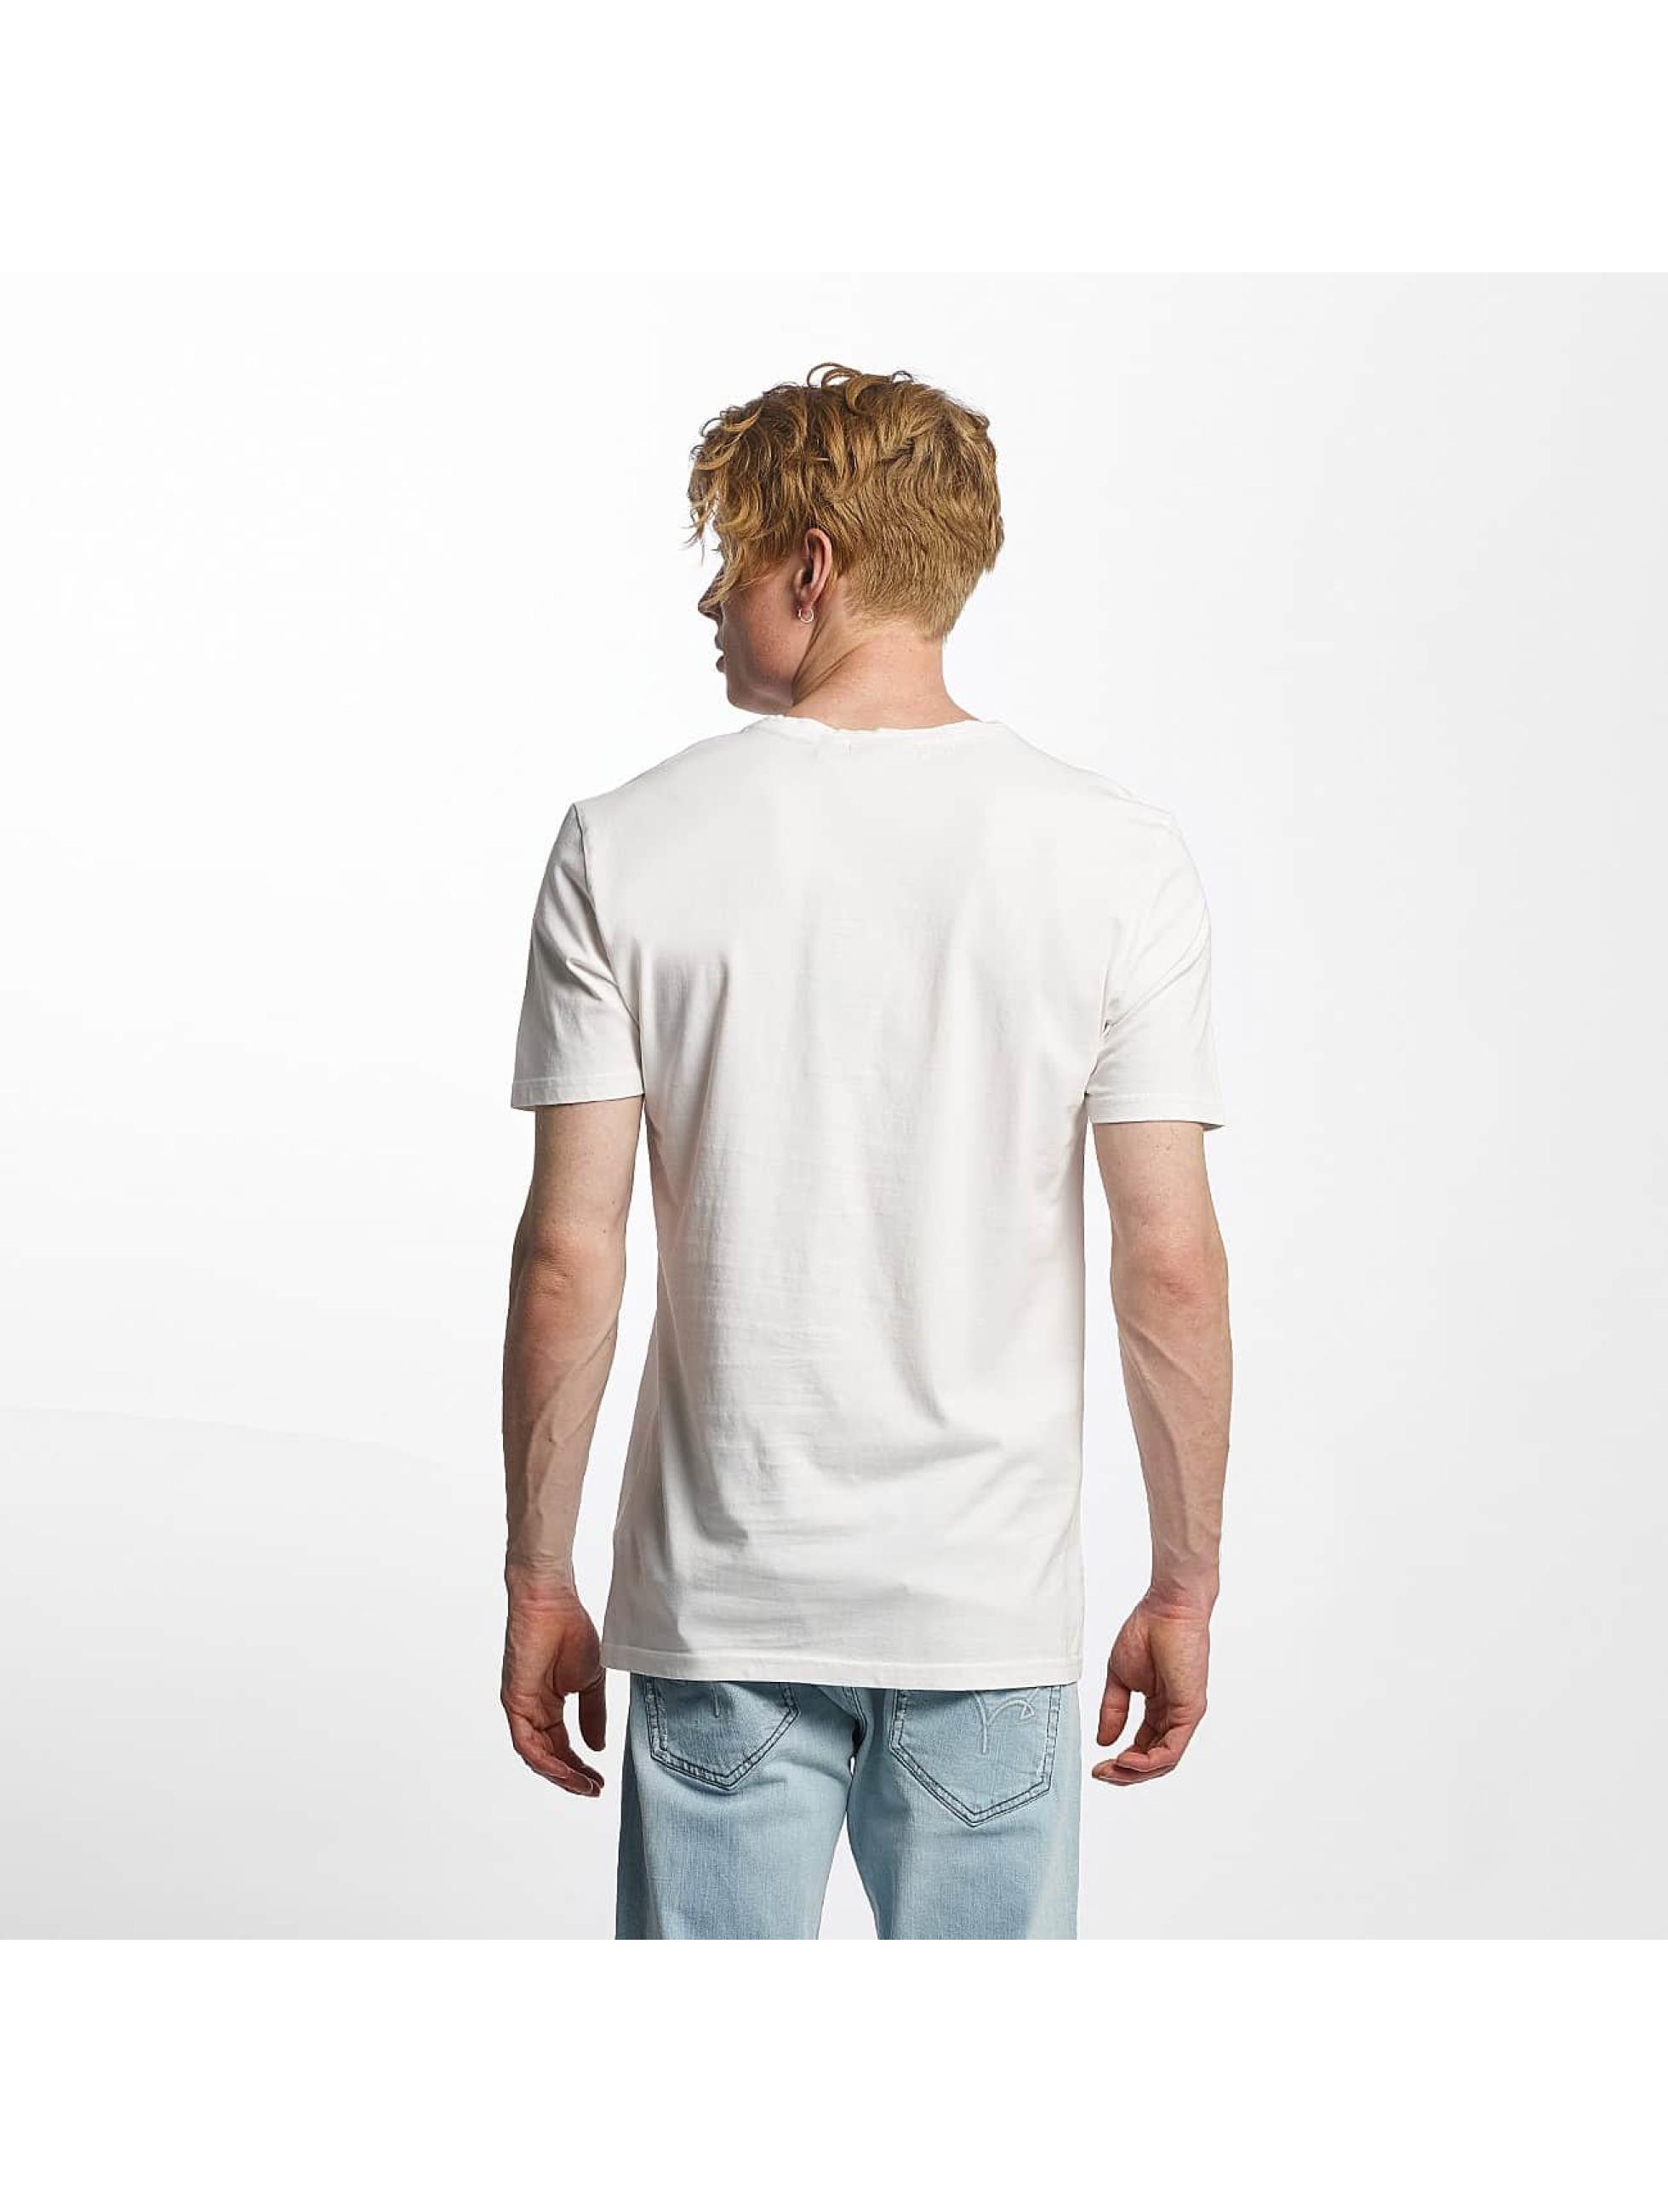 Kaporal keep living blanc homme t shirt kaporal acheter - Tee shirt kaporal pas cher homme ...